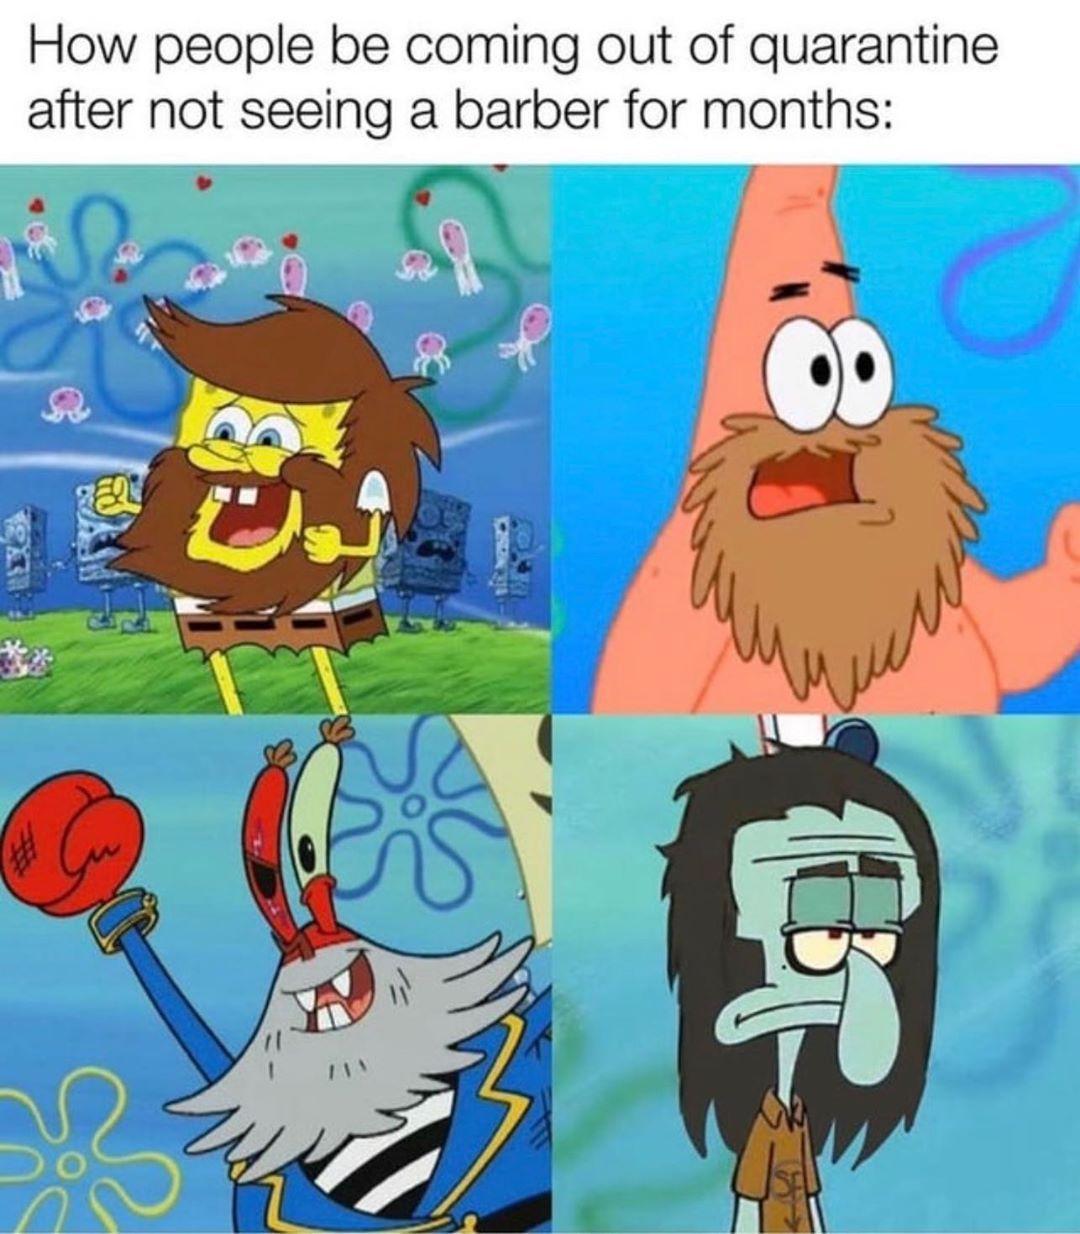 Meme S Quotes Memes Its Memes Laughing Memes Memes Quotes Funnie Memes I Meme Truthful Memes Ha In 2020 Funny Spongebob Memes Funny Relatable Memes Funny Memes